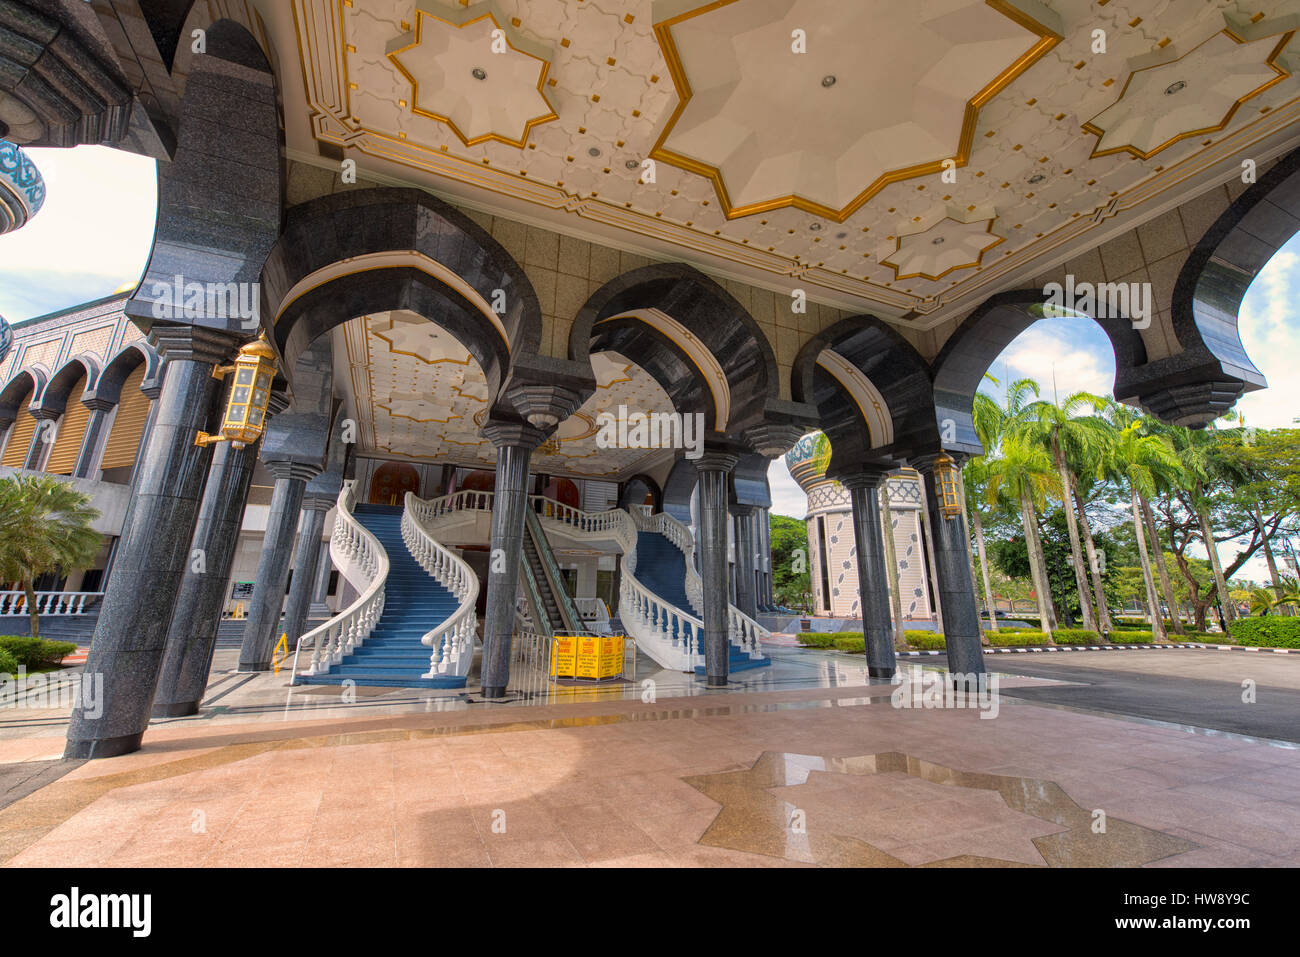 Jame'Asr Hassanil Bolkiah Mosque in Bandar Seri Begawan, Brunei - Stock Image